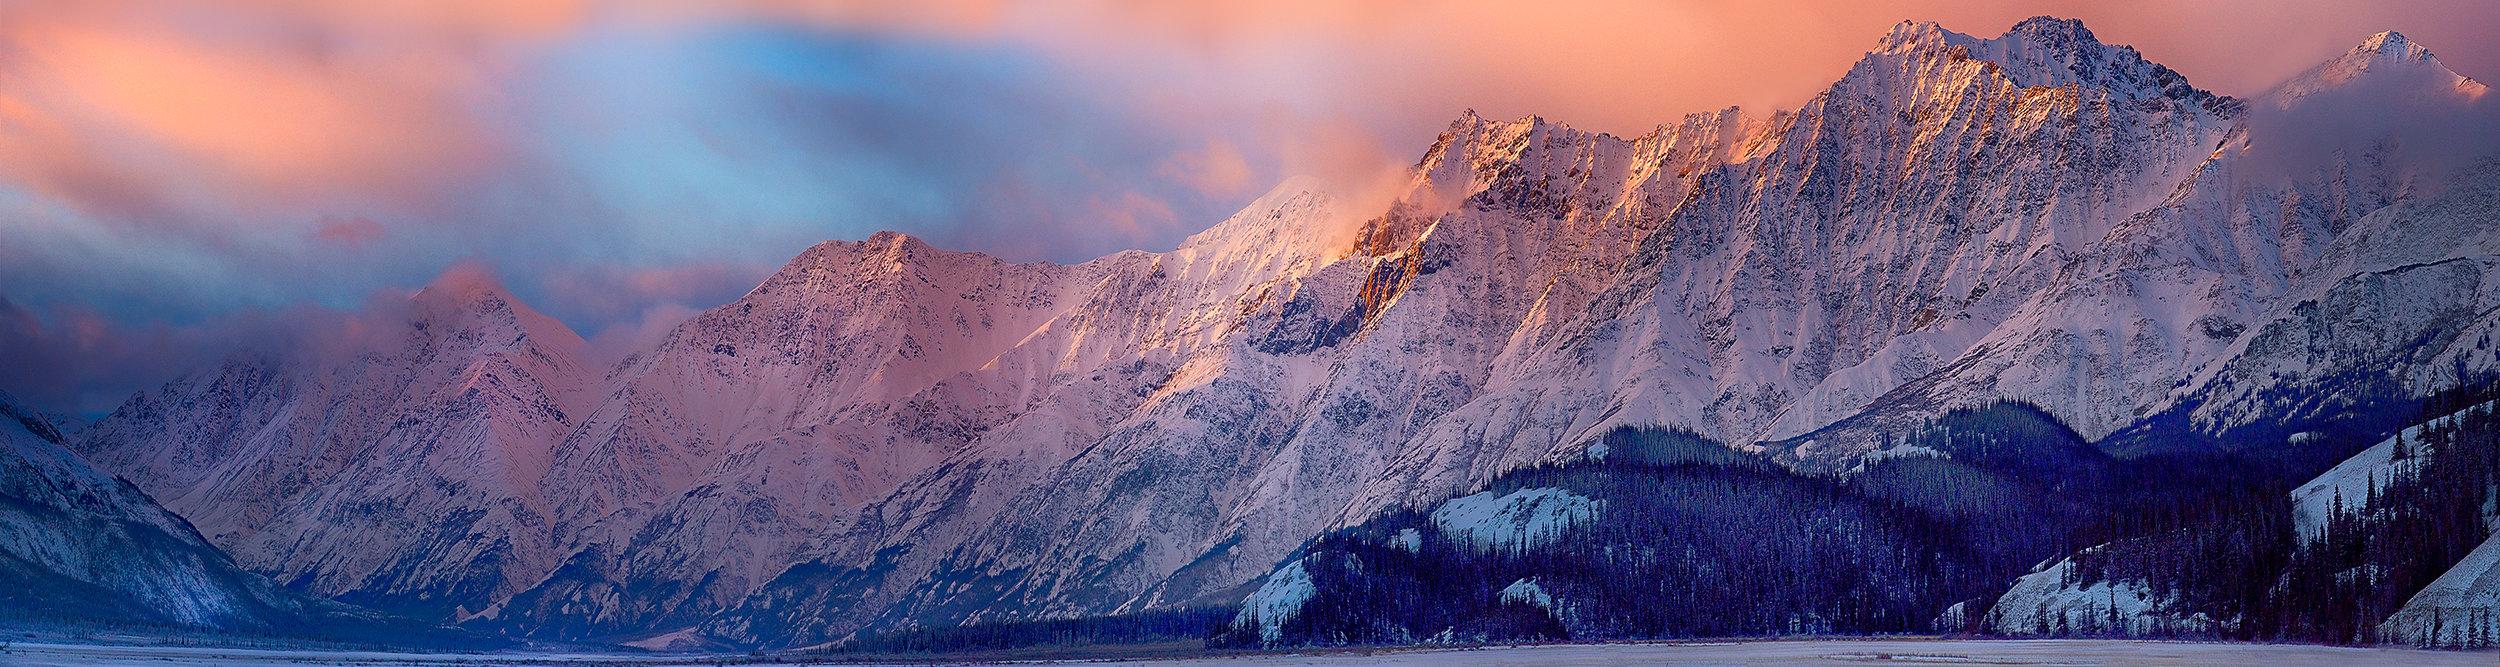 Yukon | ©2018 Brian Rivera Uncapher